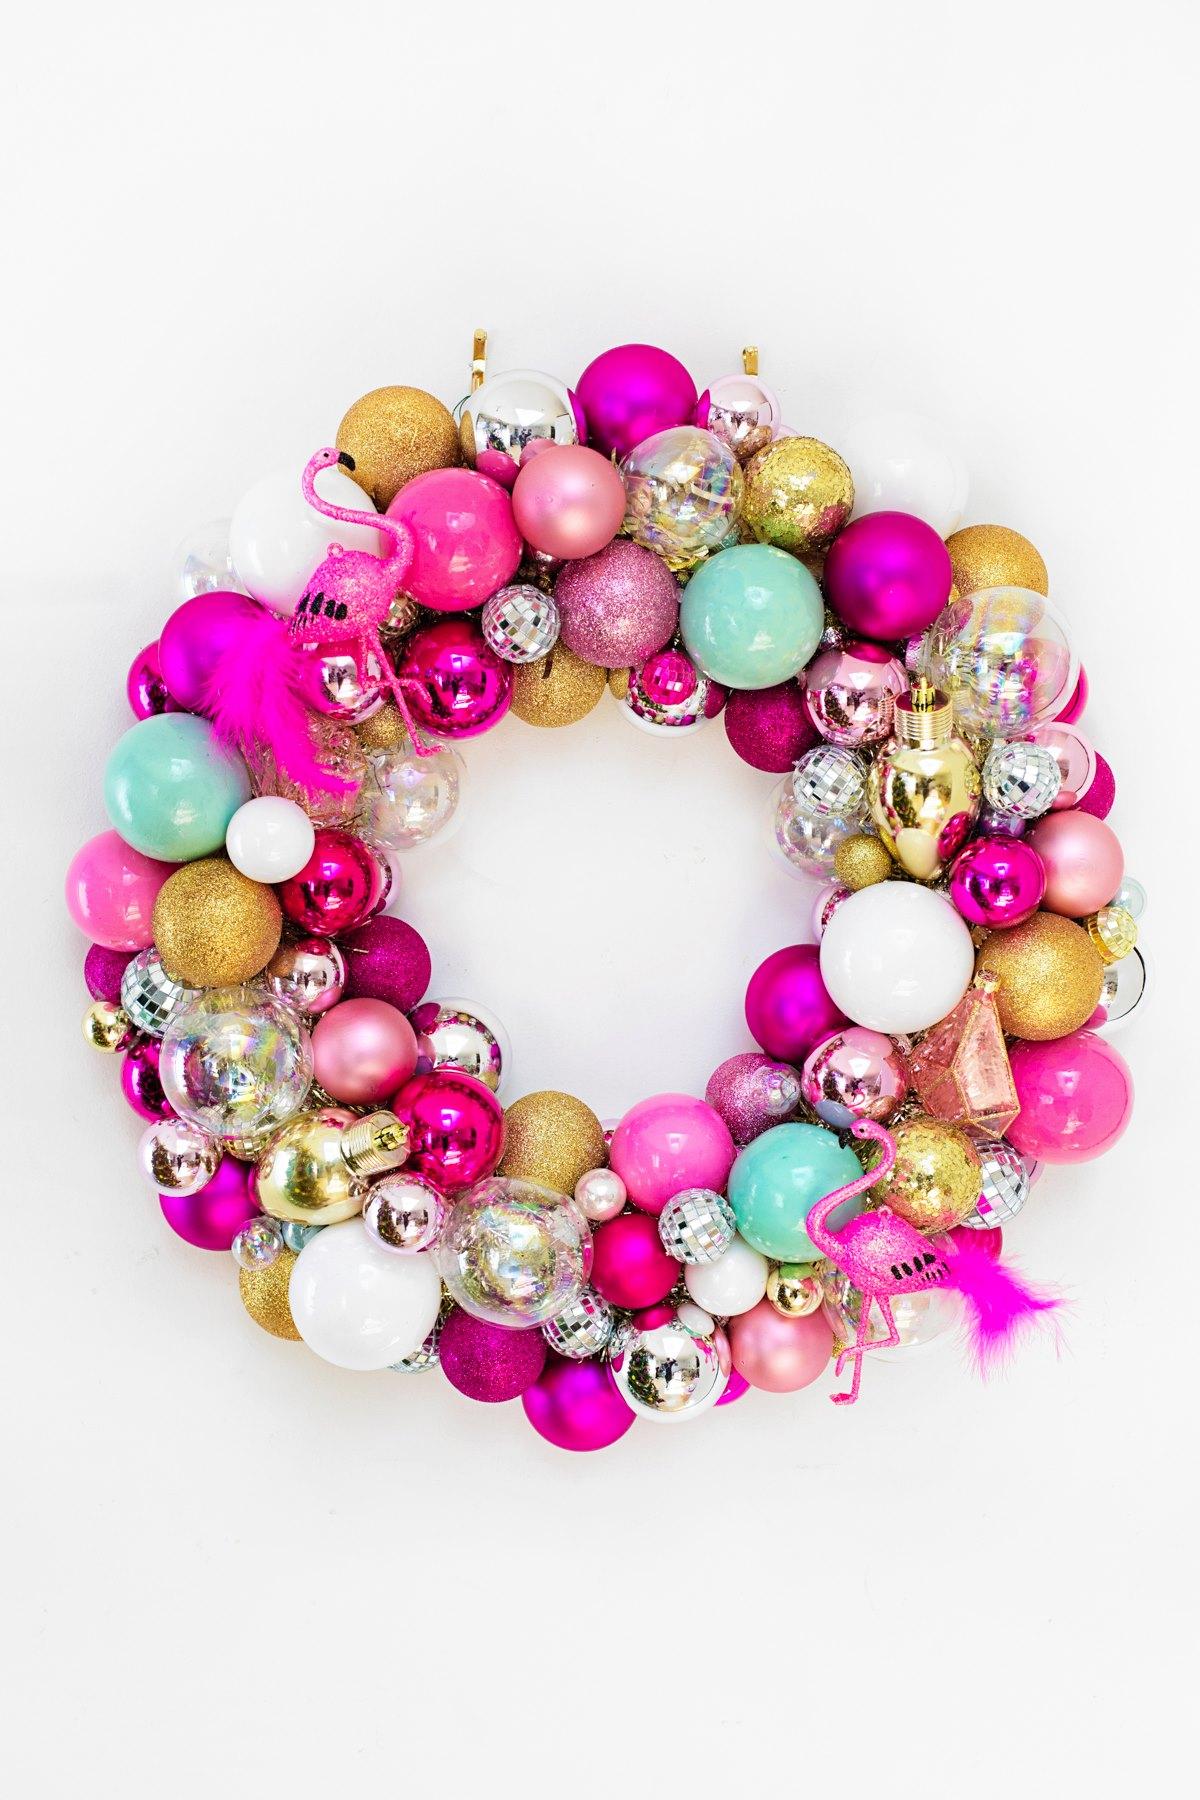 Ornament wreath from Studio DIY